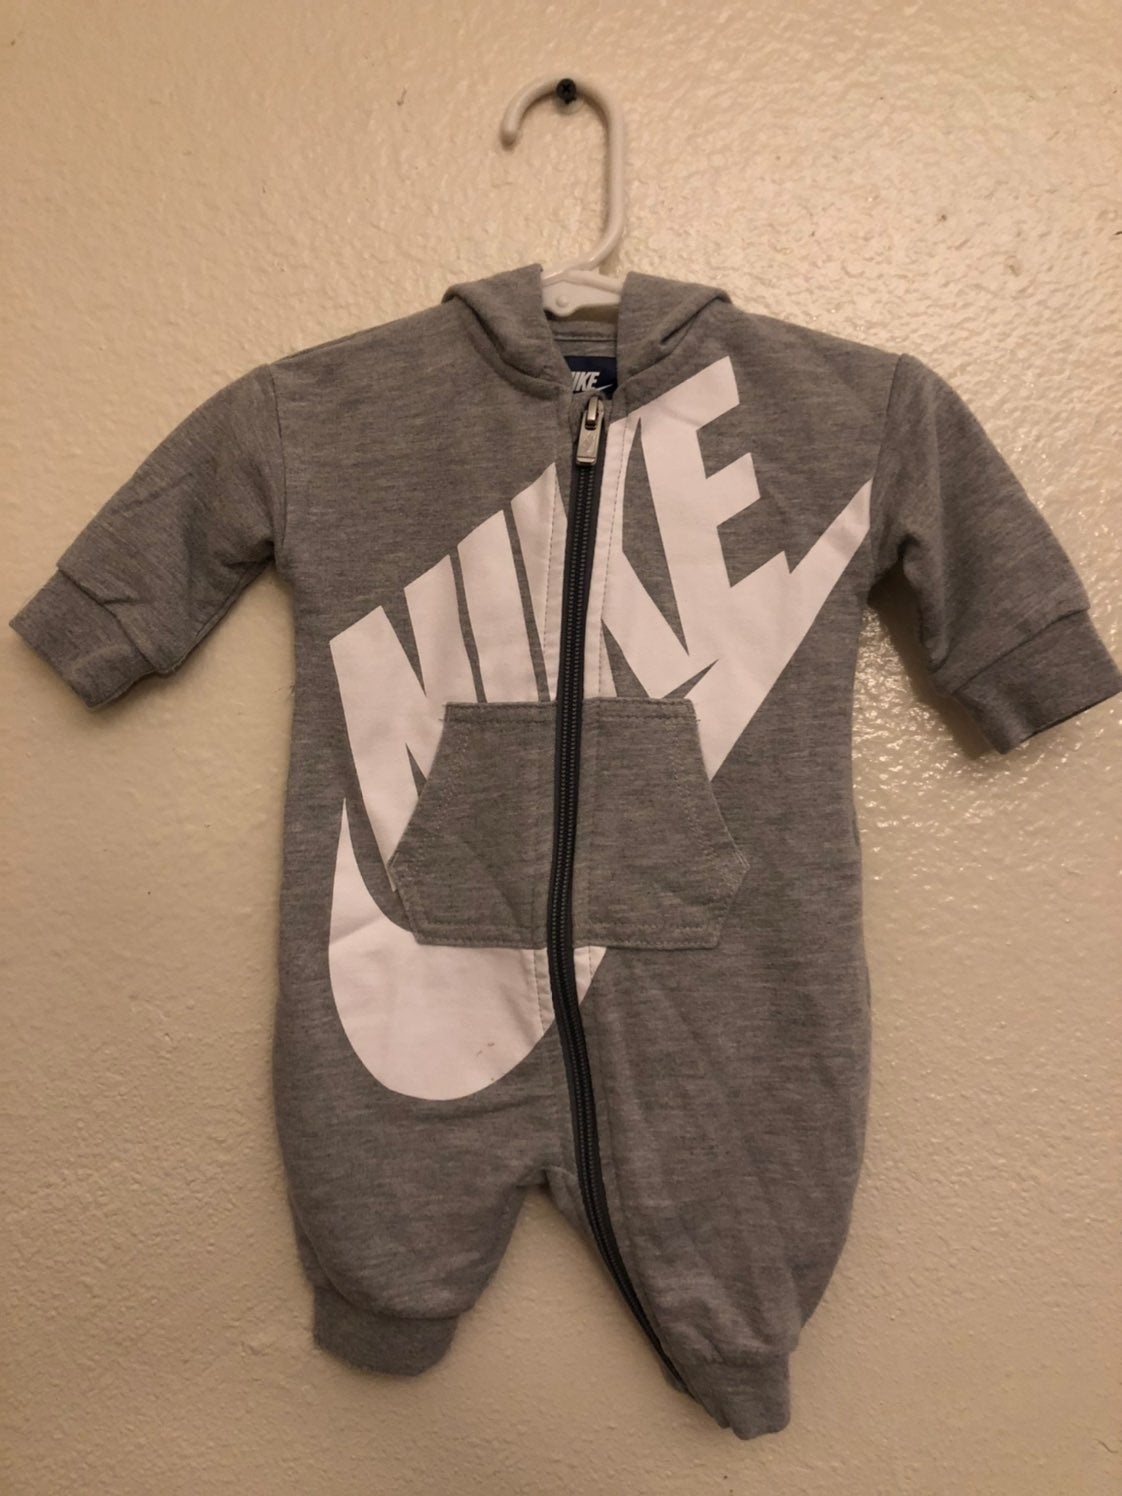 Nike Baby Boy Romper